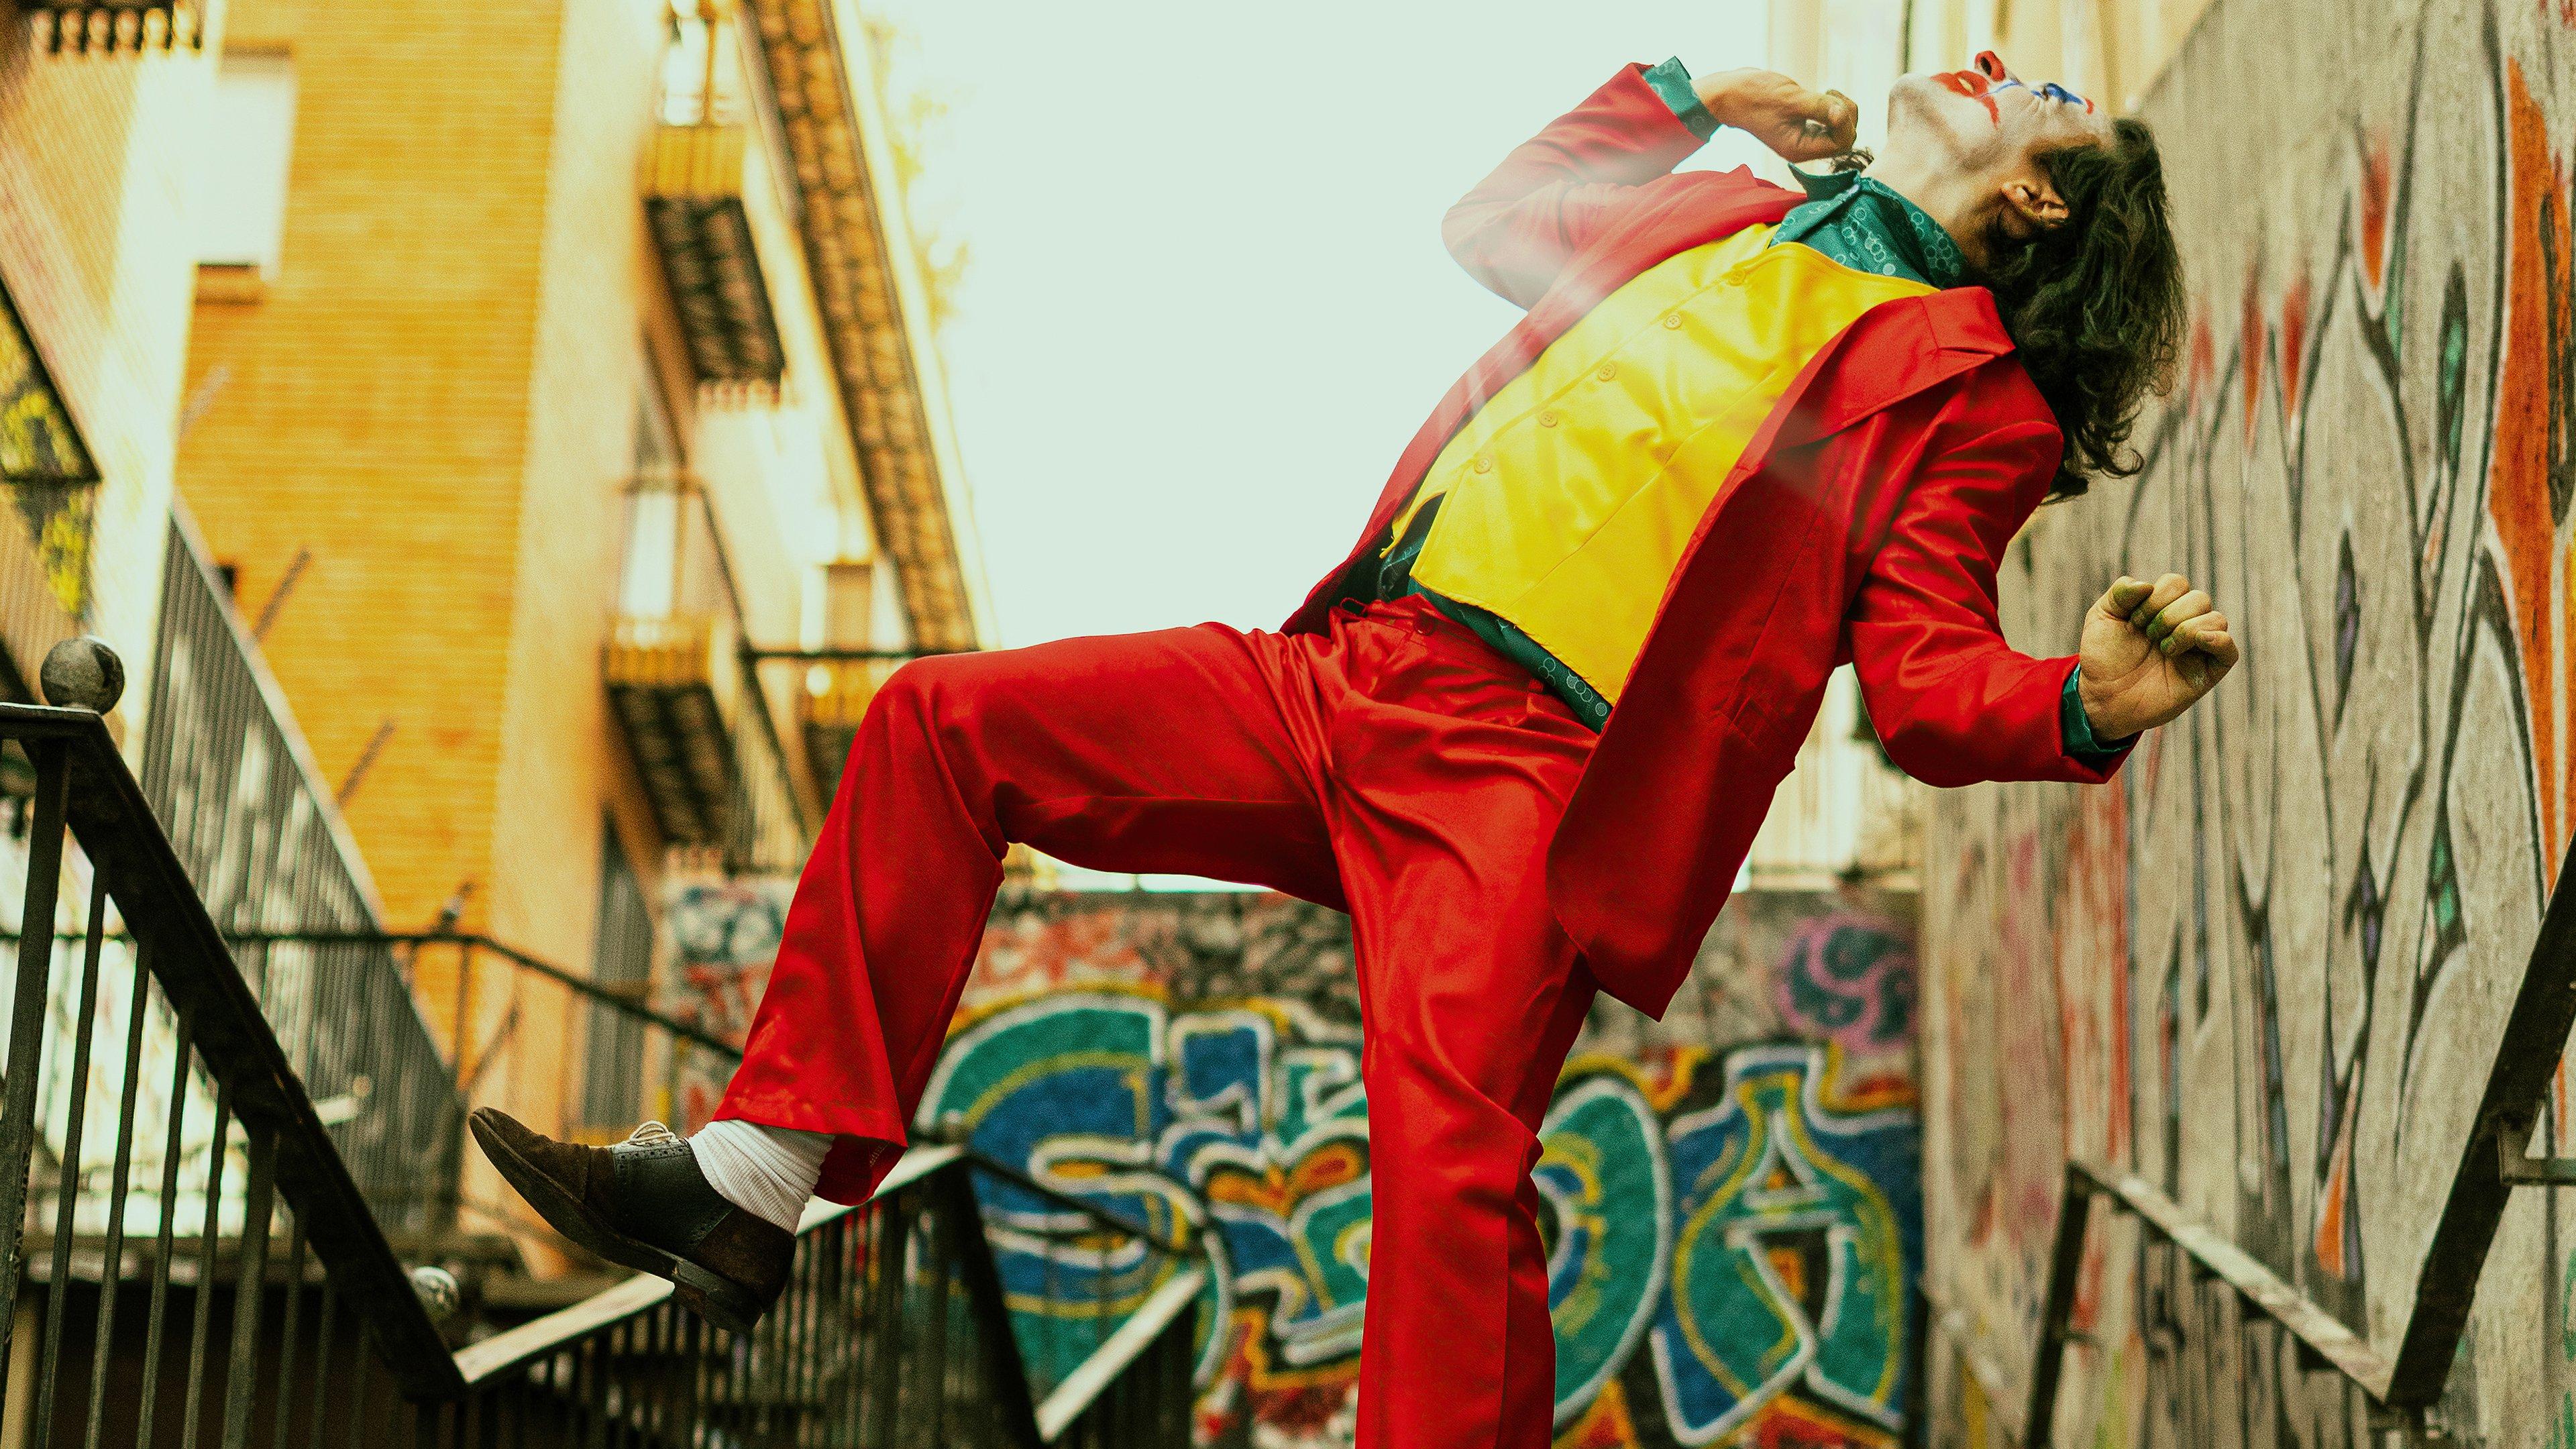 Wallpaper Joker in the stairs